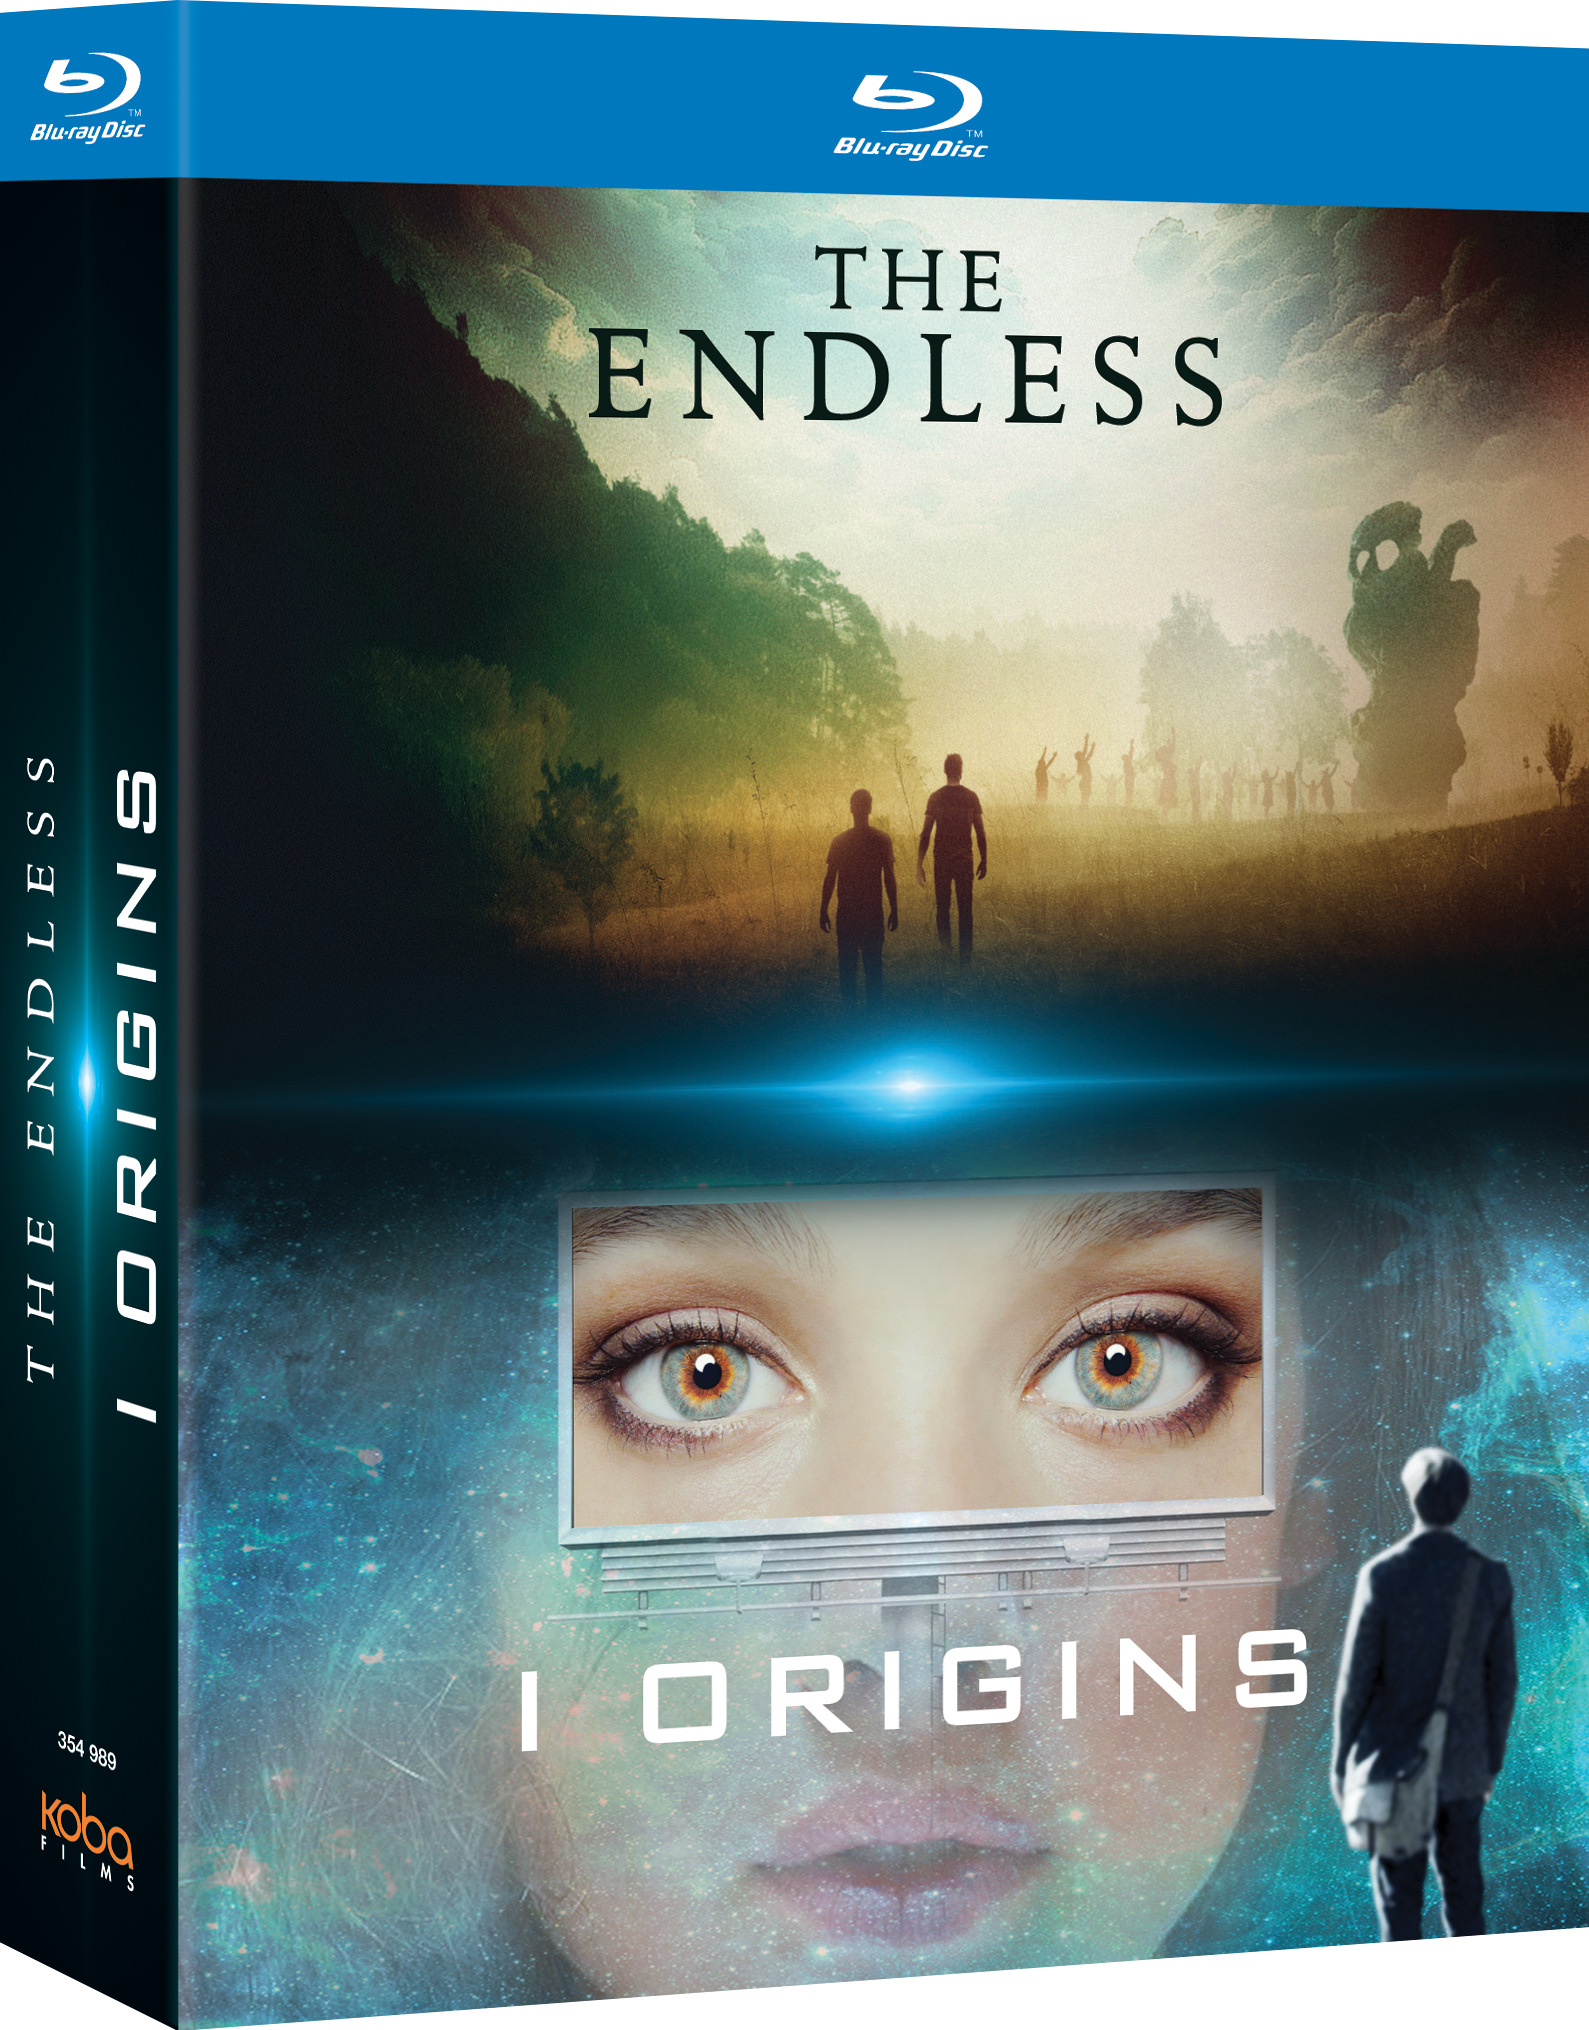 2 FILMS-CULTES DE SCIENCE-FICTION (I-ORIGINS + THE ENDLESS) - BRD